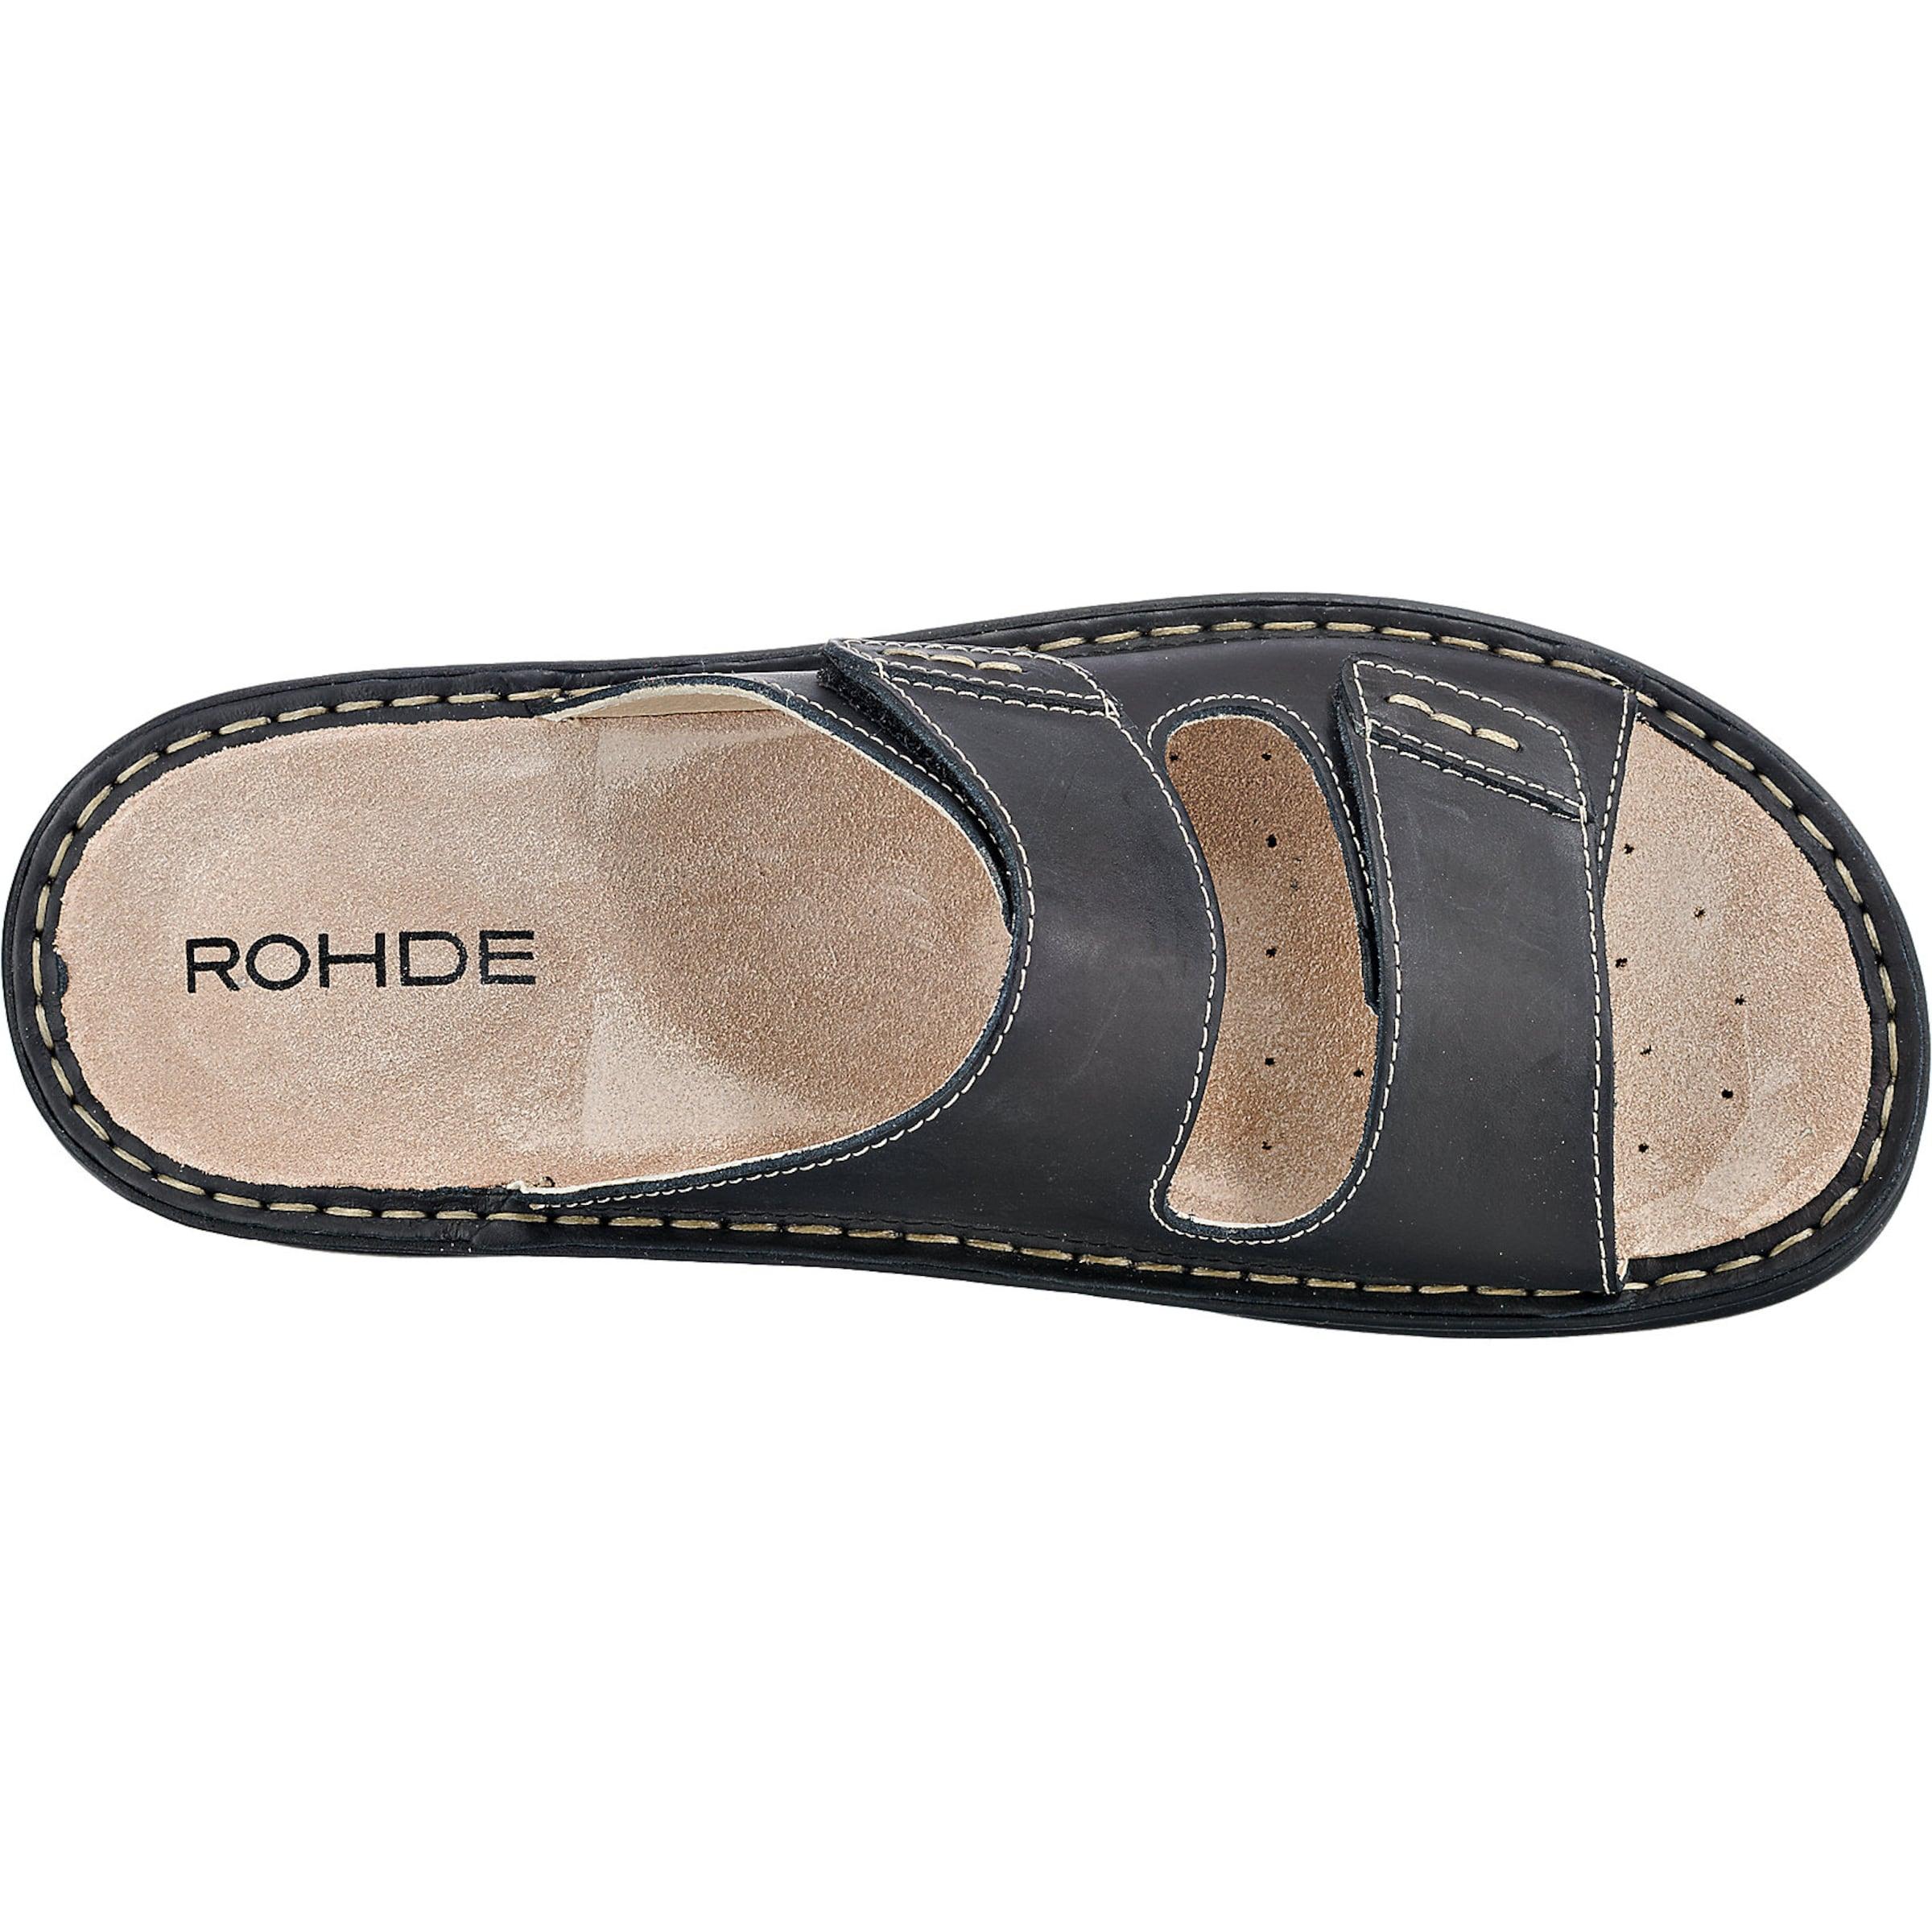 Rohde Pantoletten Schwarzmeliert In In Rohde Pantoletten Schwarzmeliert 435jARL